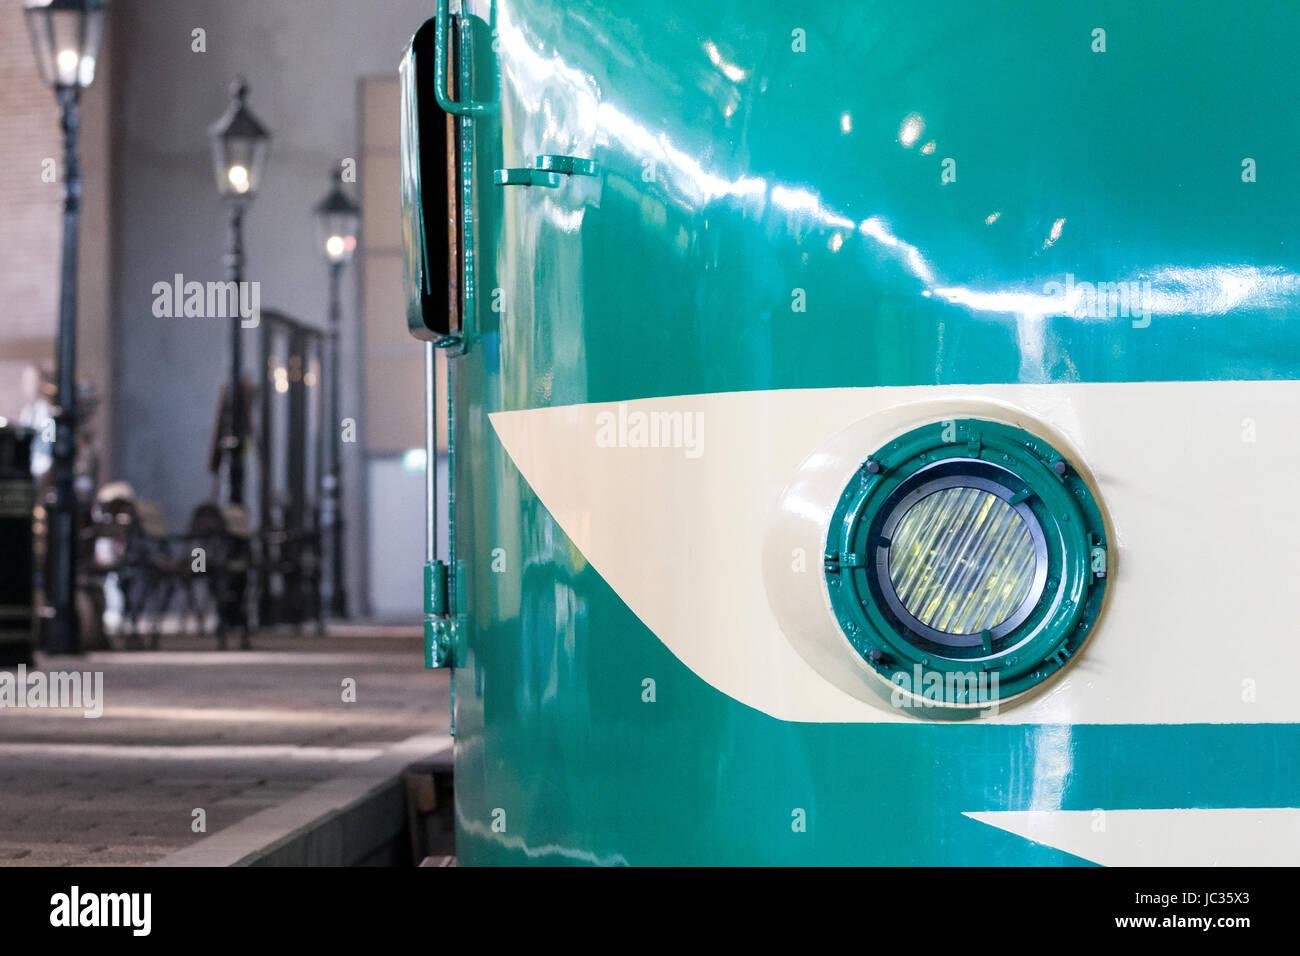 Closeup of a train headlight shining, vintage train Stock Photo